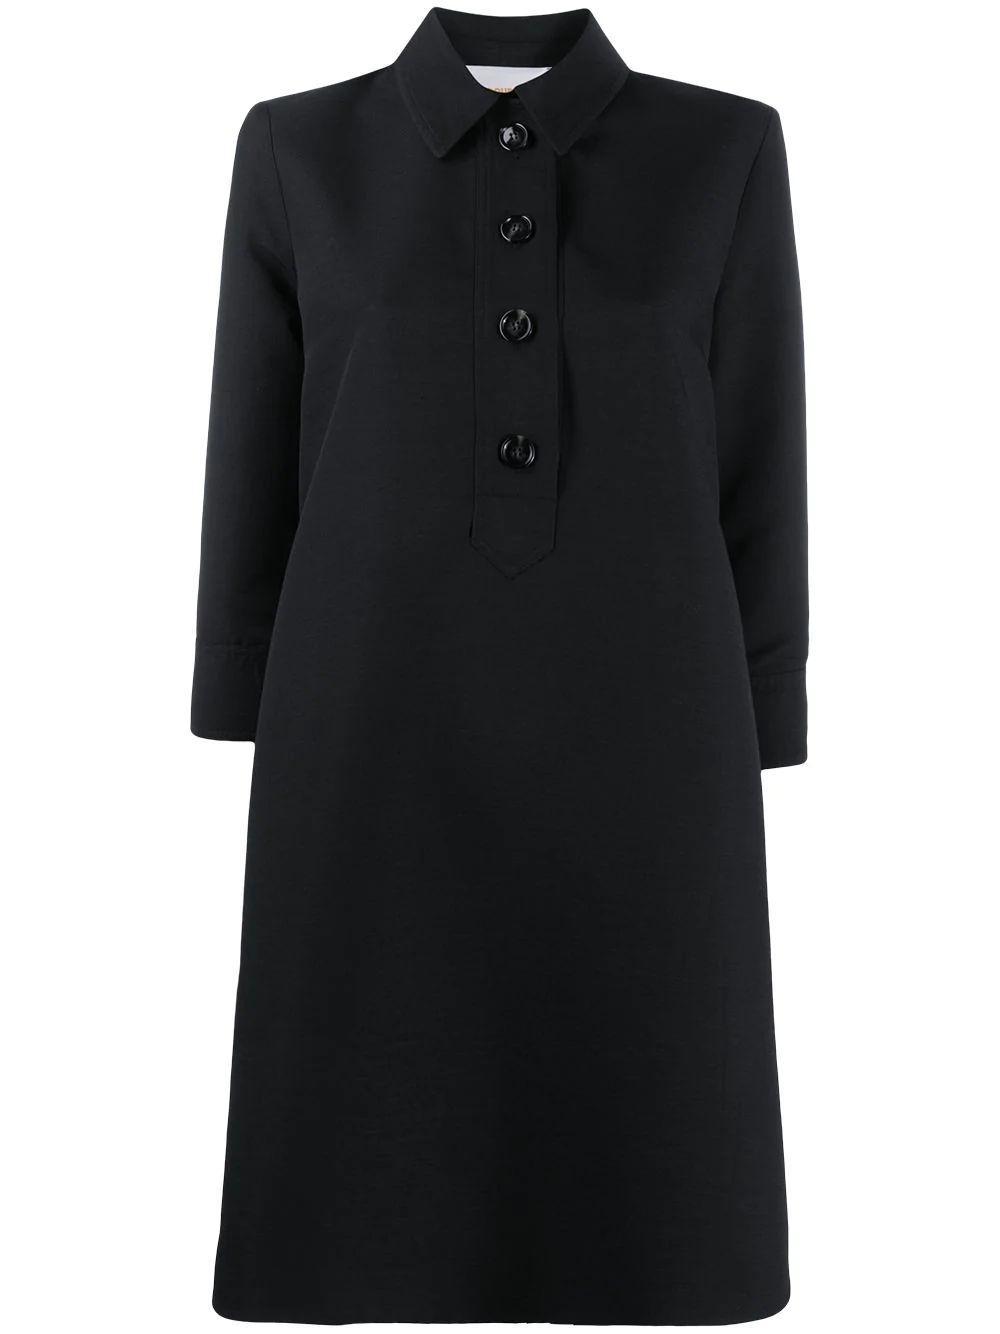 Artemis Shirt Dress Item # DRE0180-CAD001